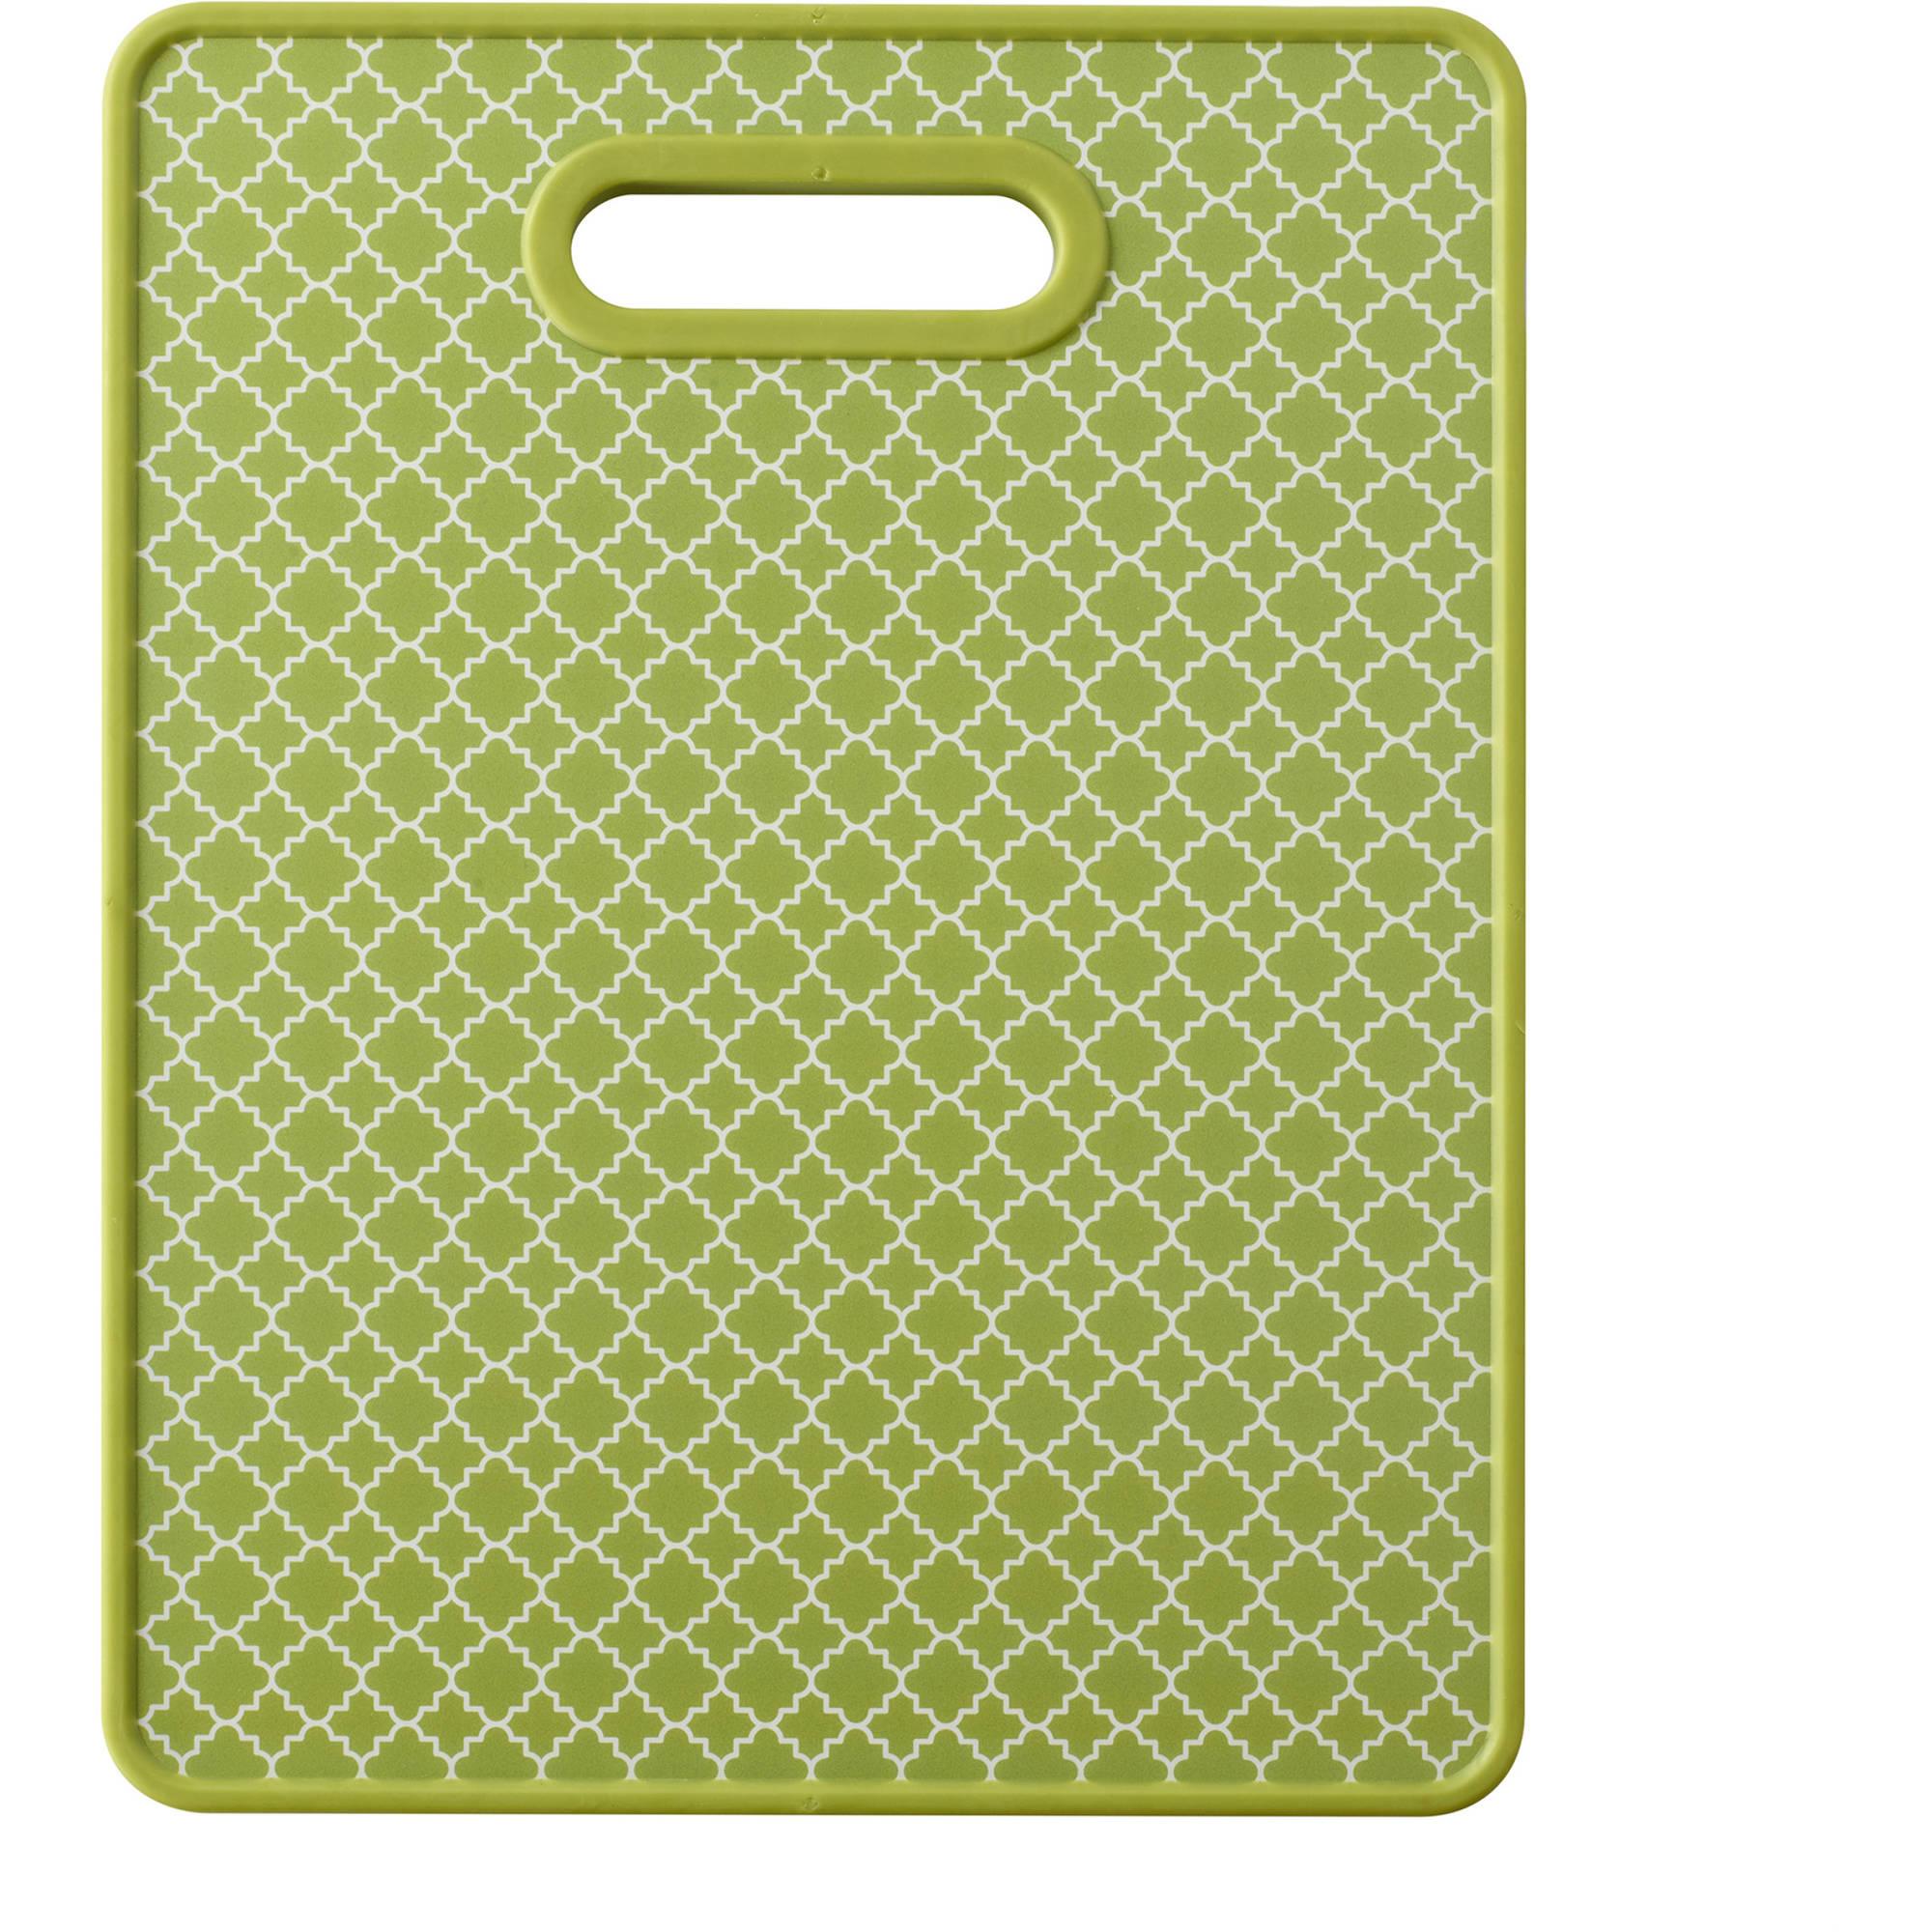 "Farberware 11"" x 14"" Nonslip Cutting Board, Trellis Green"